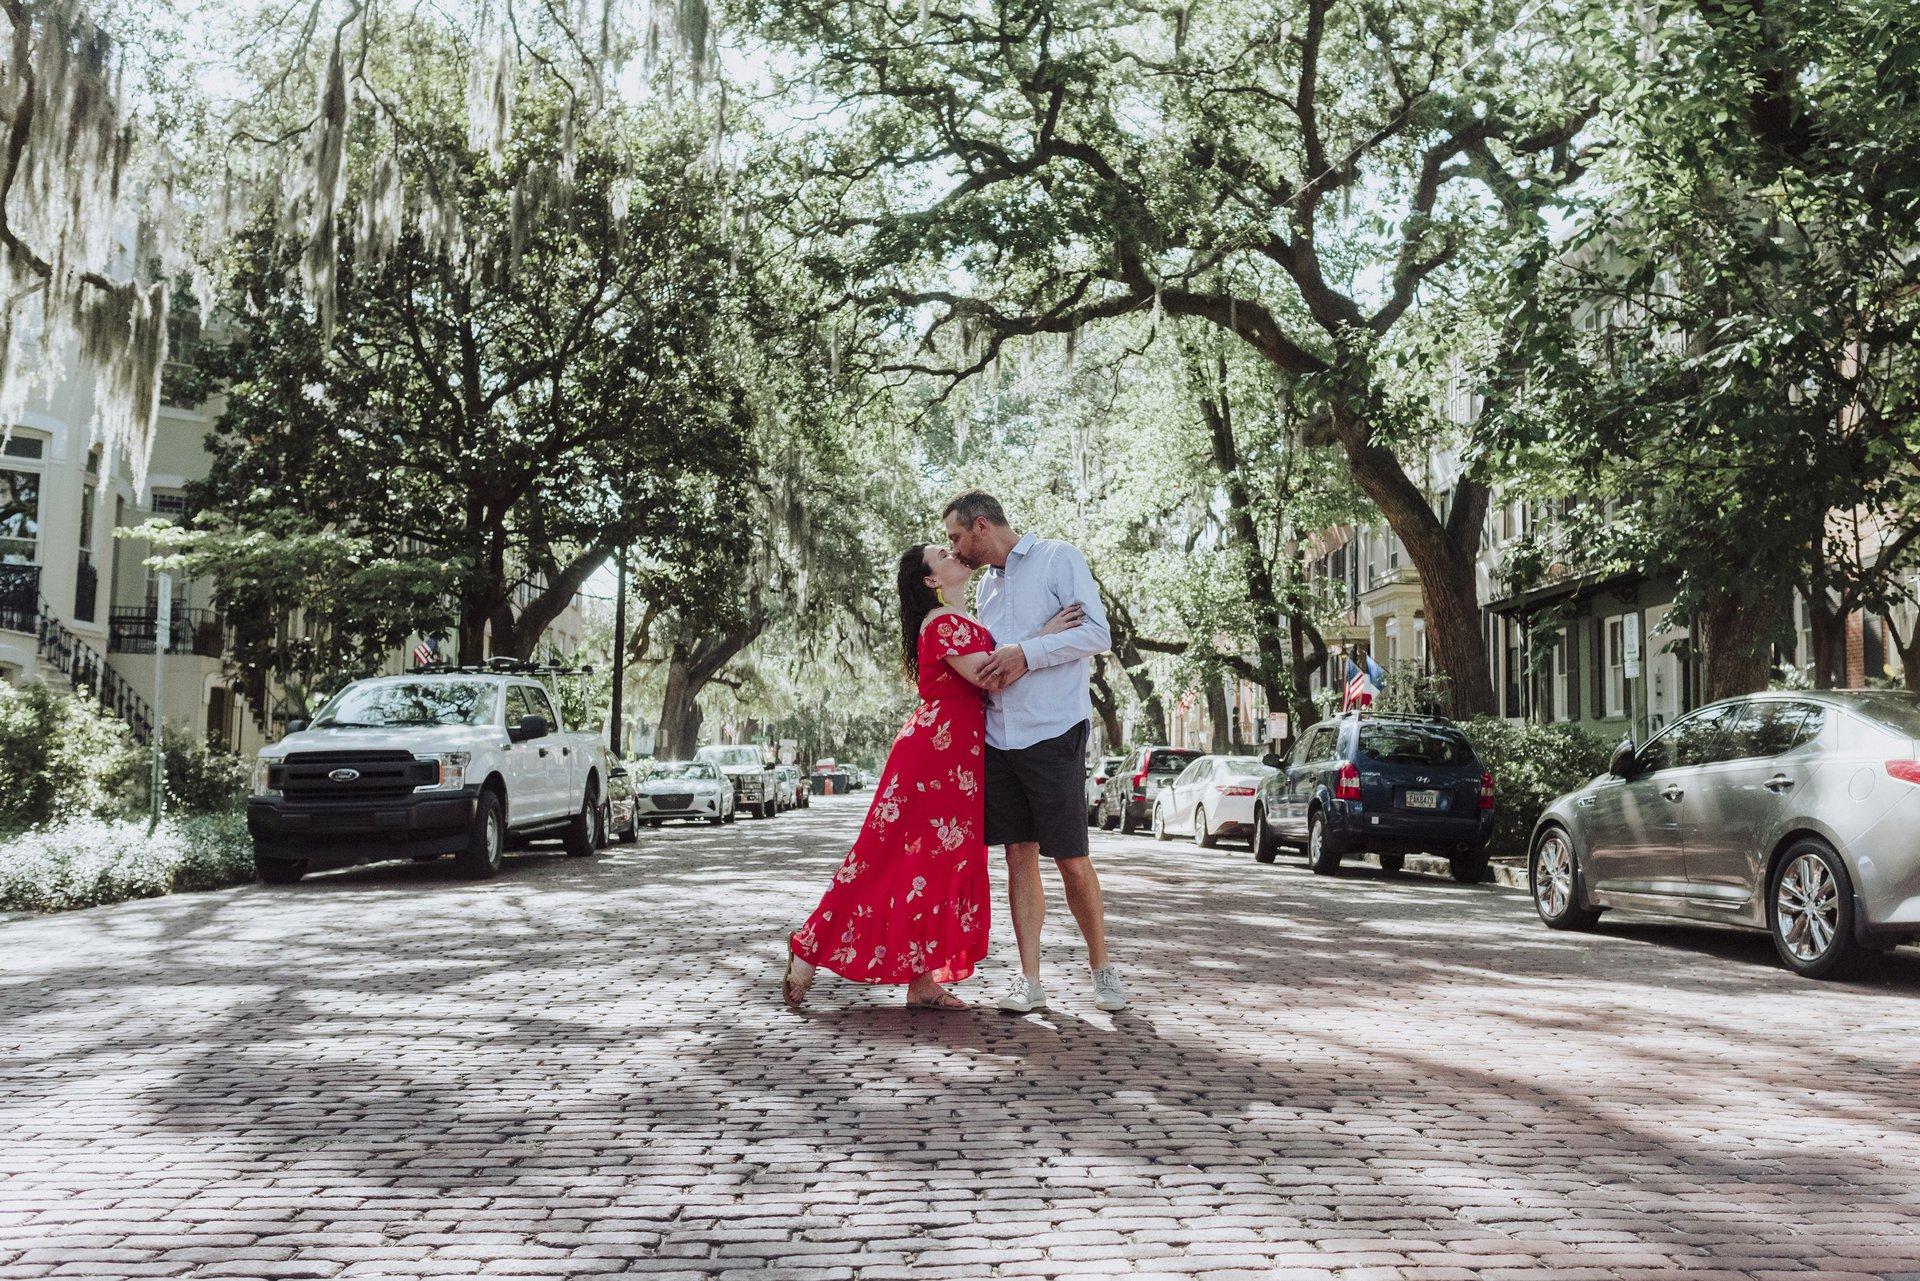 Savannah-United States-travel-story-Flytographer-32